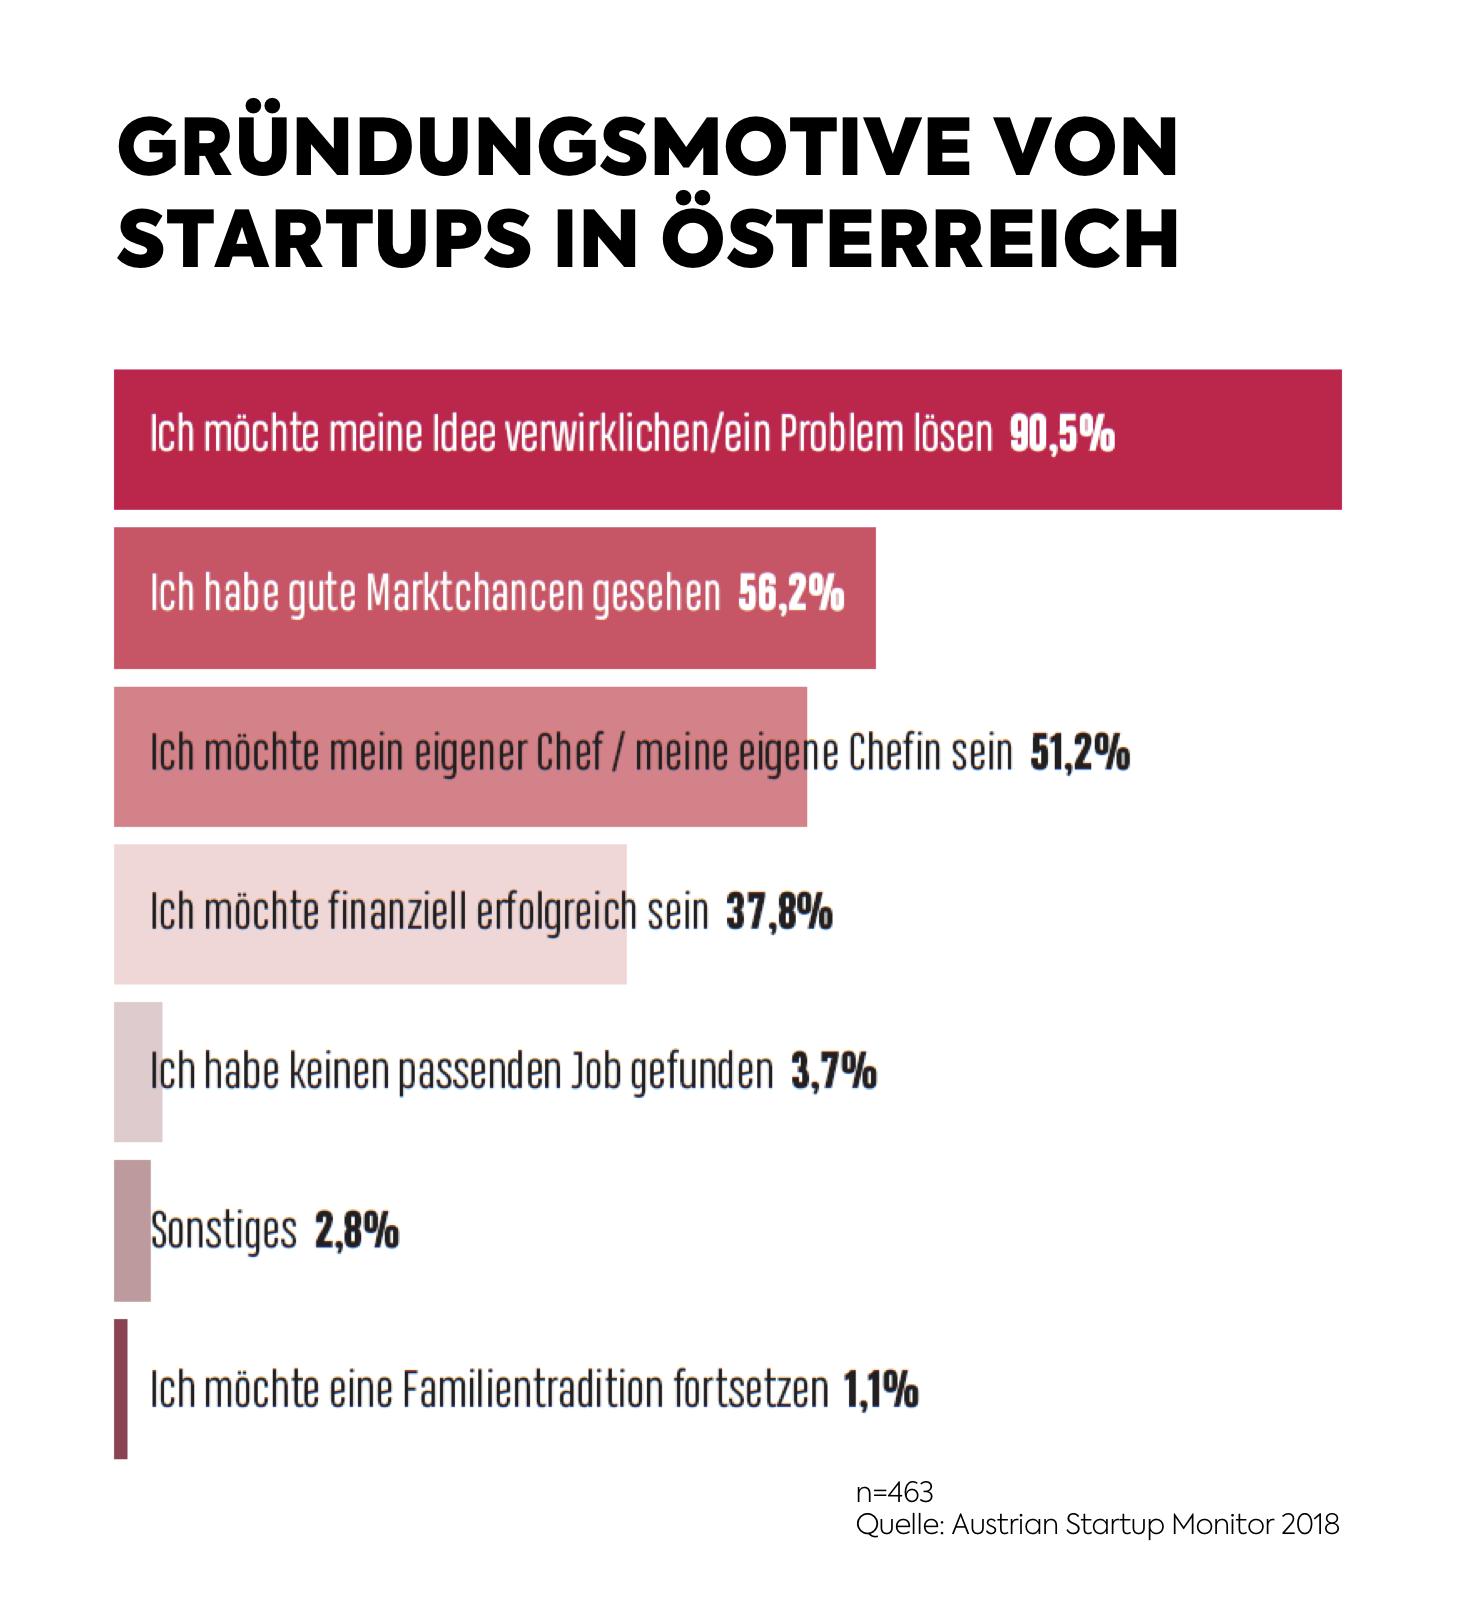 1. Austrian Startup Monitor - Motive